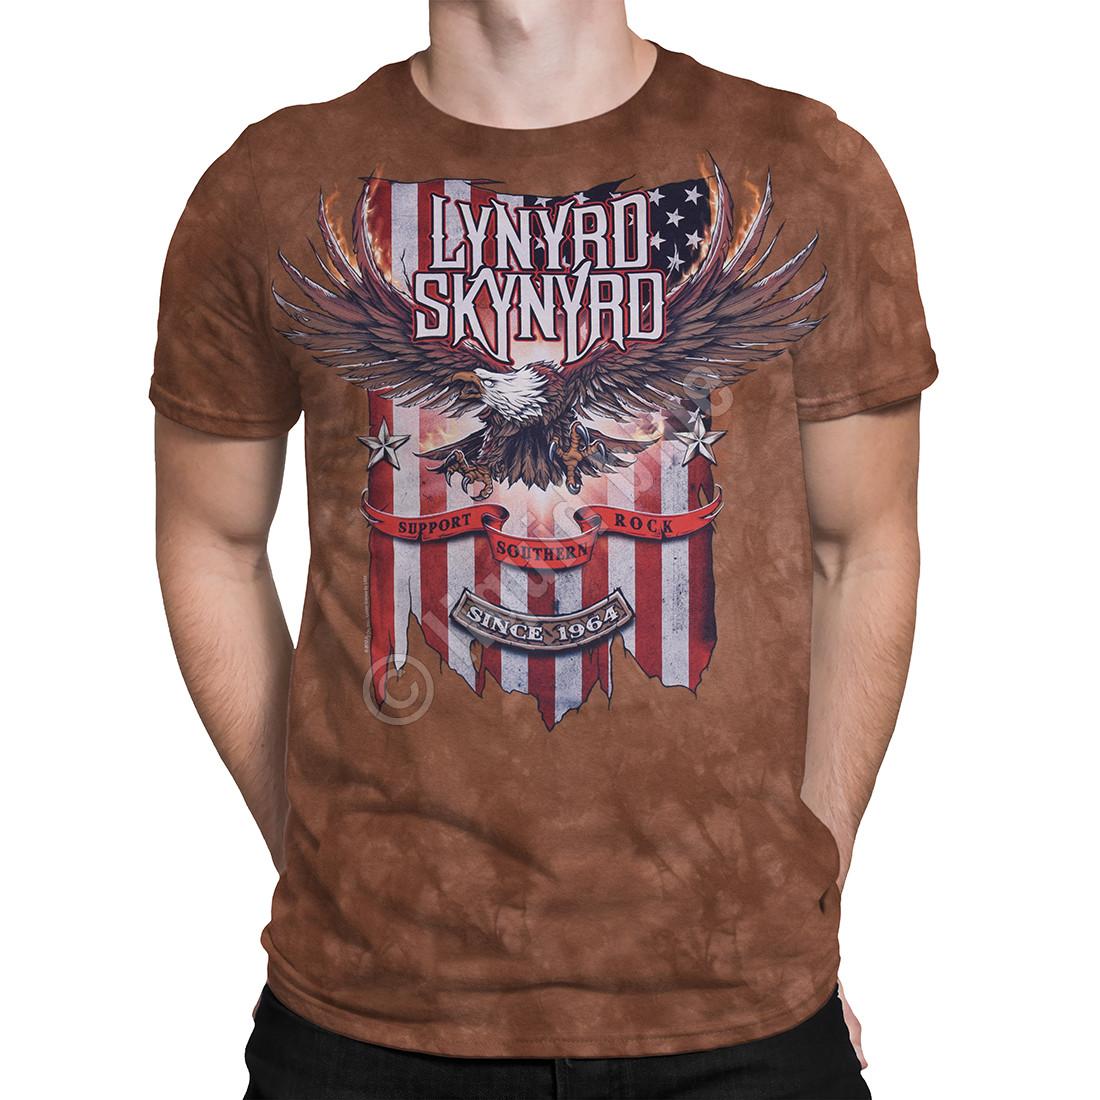 b544fffe89dc73 Lynyrd Skynyrd Support Southern Rock Tie-Dye T-Shirt Tee Liquid Blue